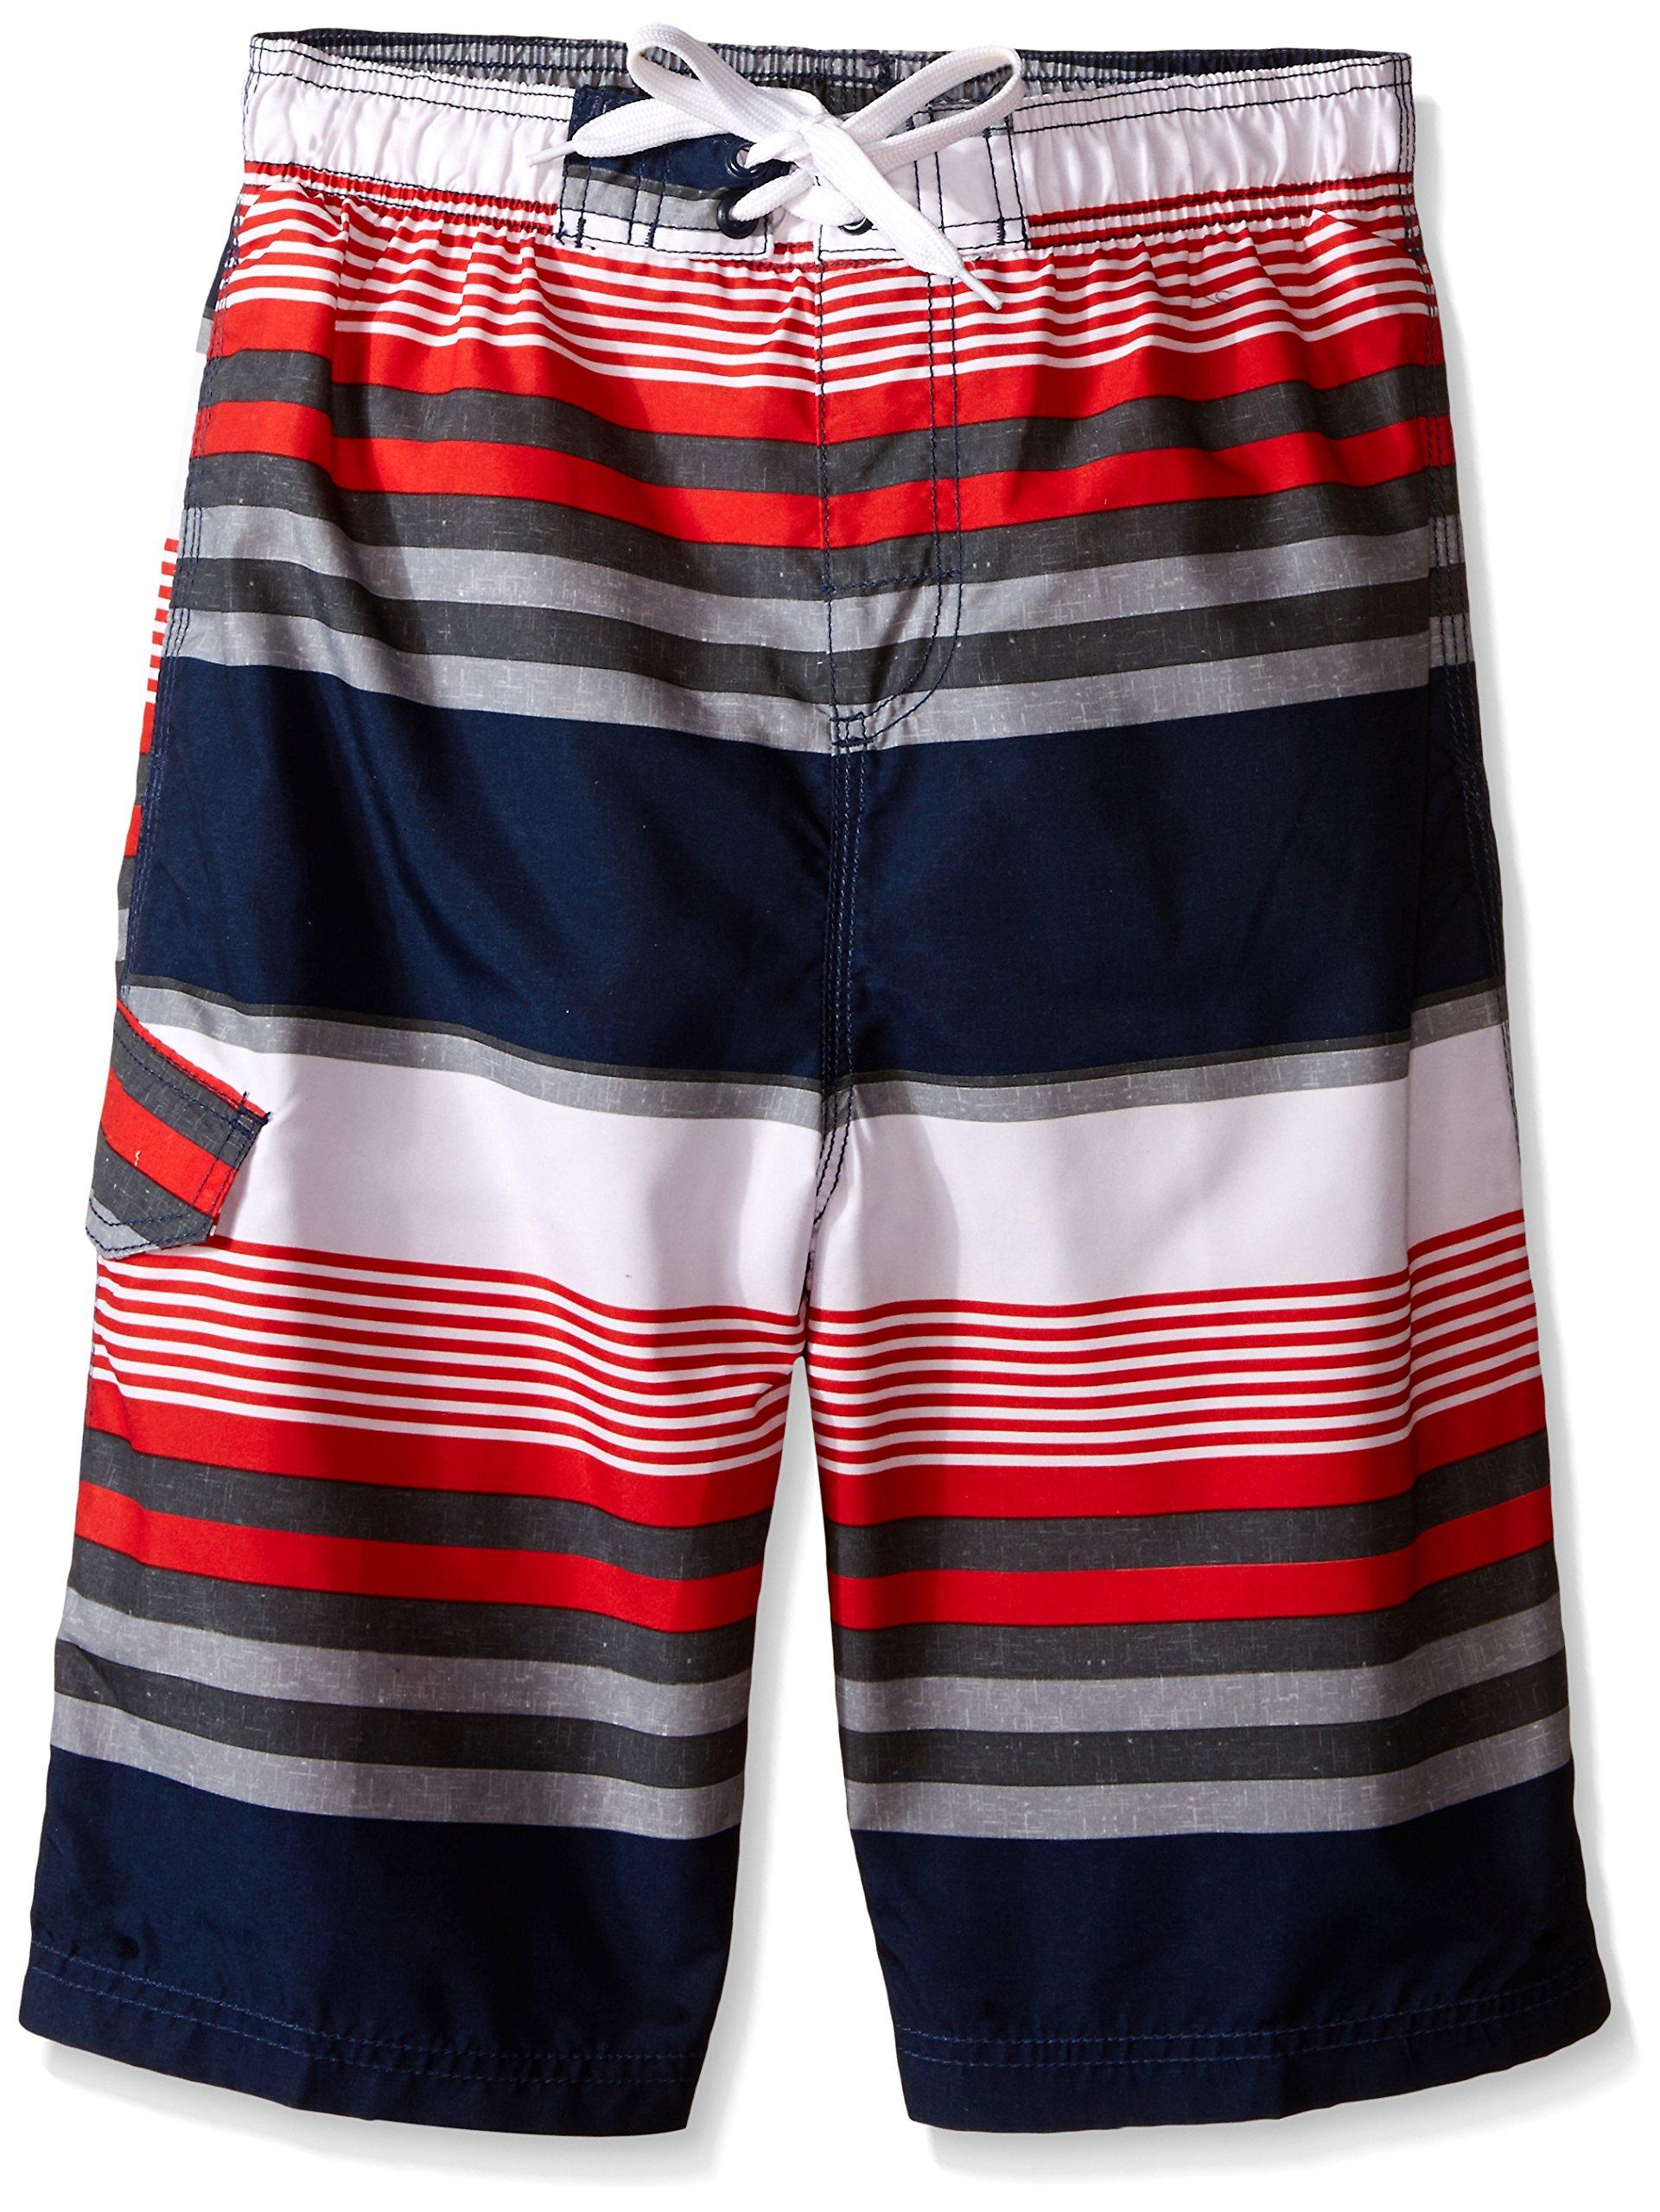 Kanu Surf Big Boys' Optic Stripe Swim Trunk, Navy/Red, Medium (10/12)